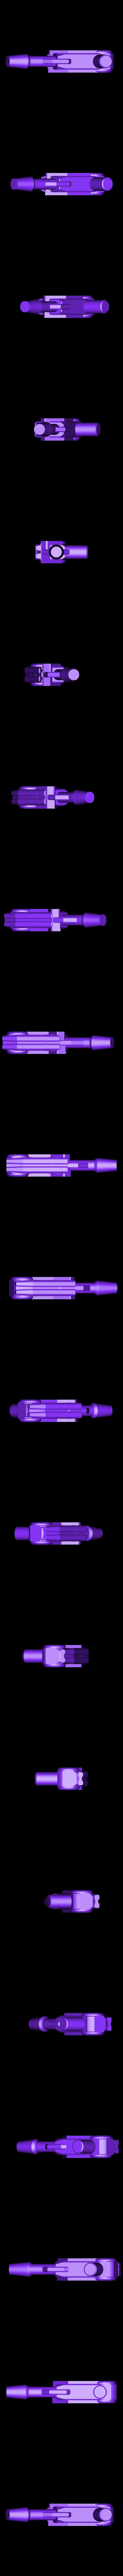 simple_gun_v5.stl Download free STL file Transformers guns • 3D printable model, sickofyou